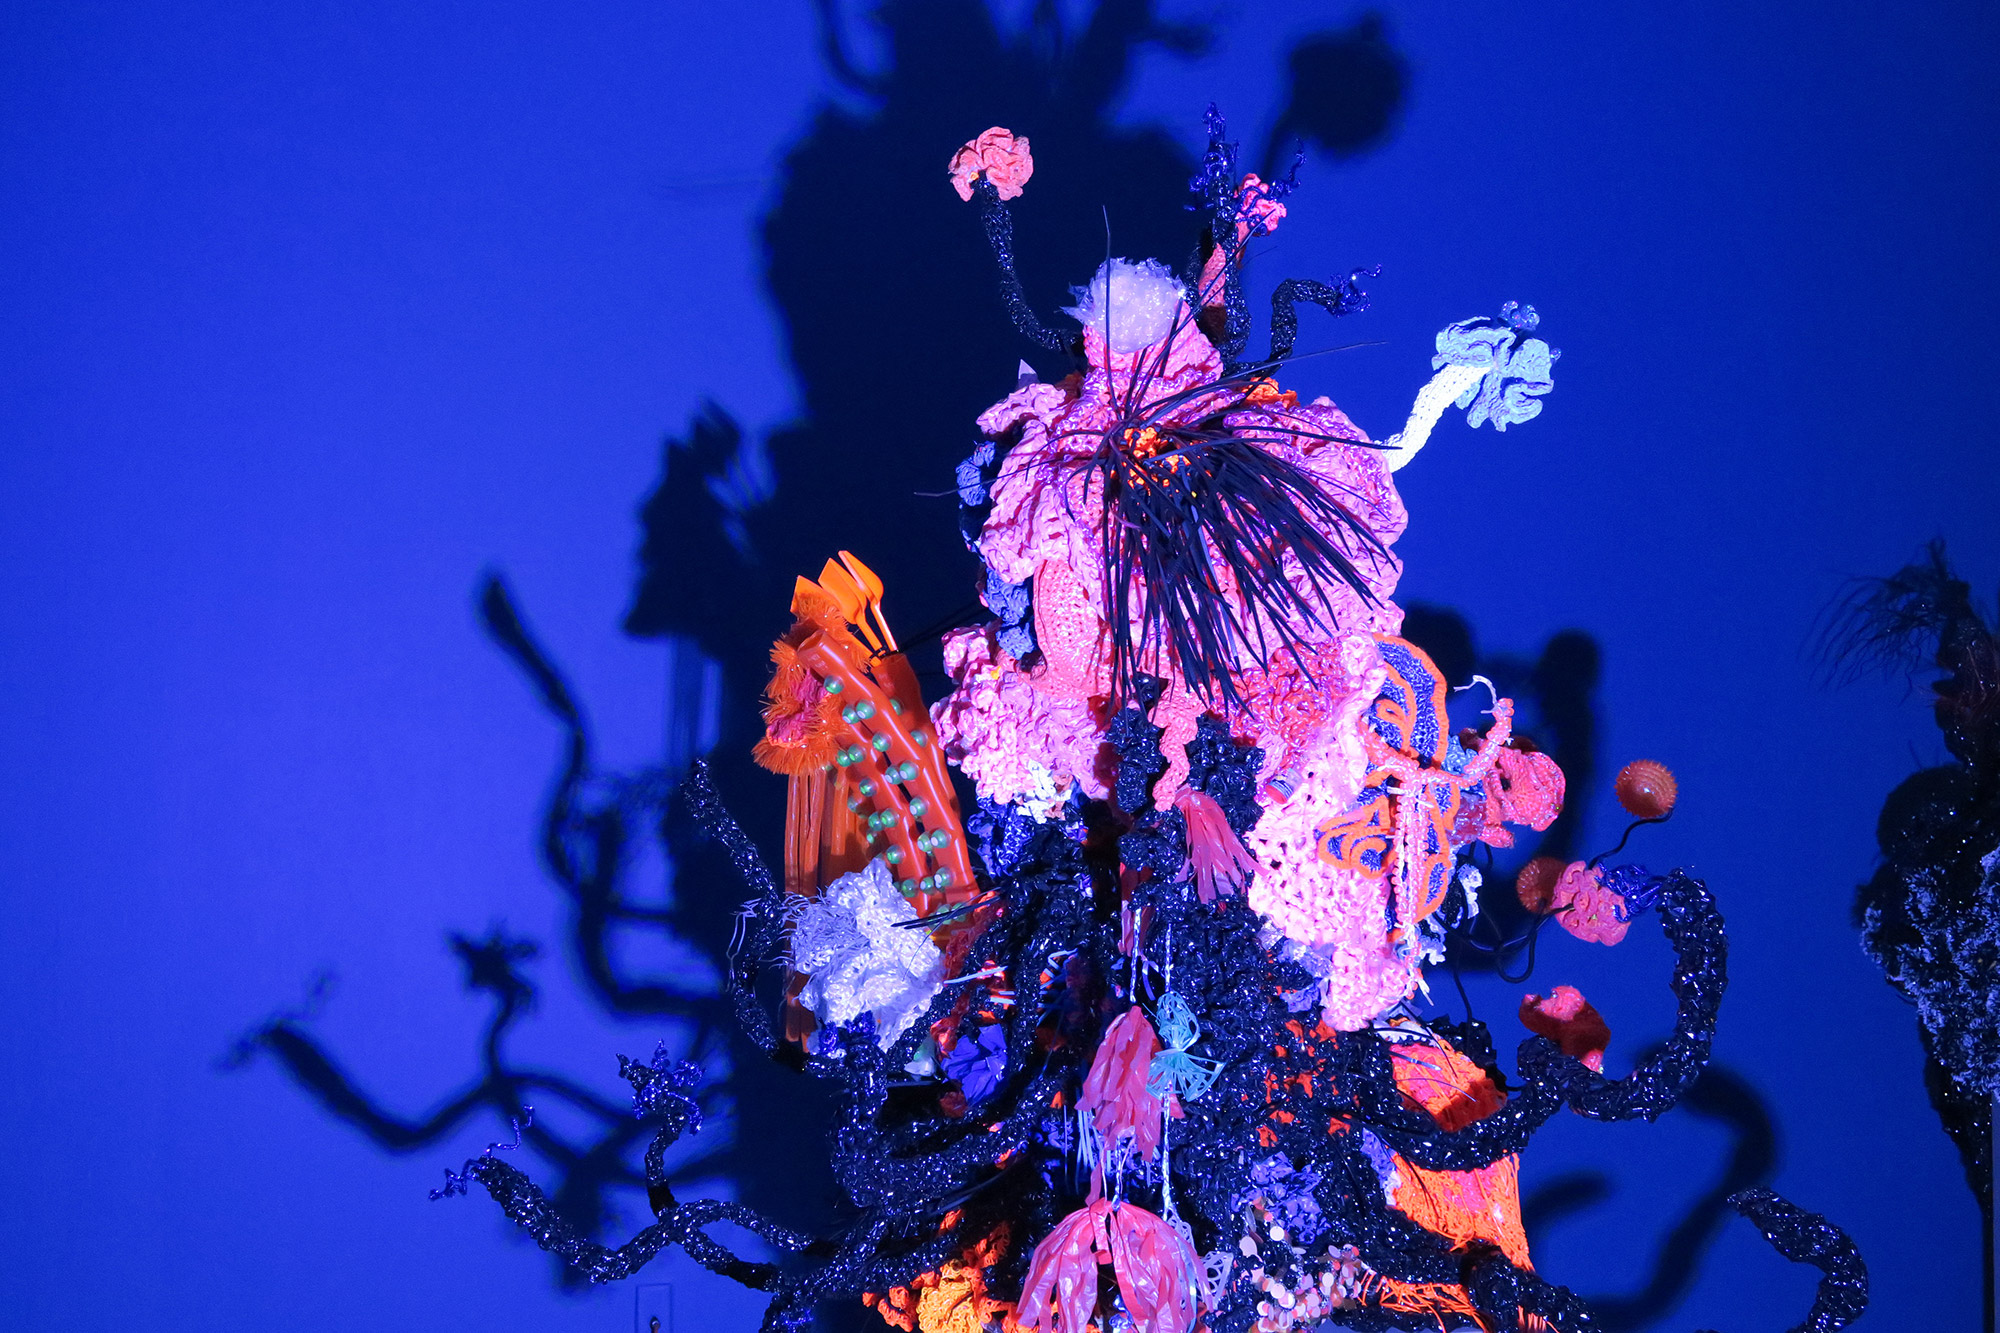 Reef sculpture against intense blue background